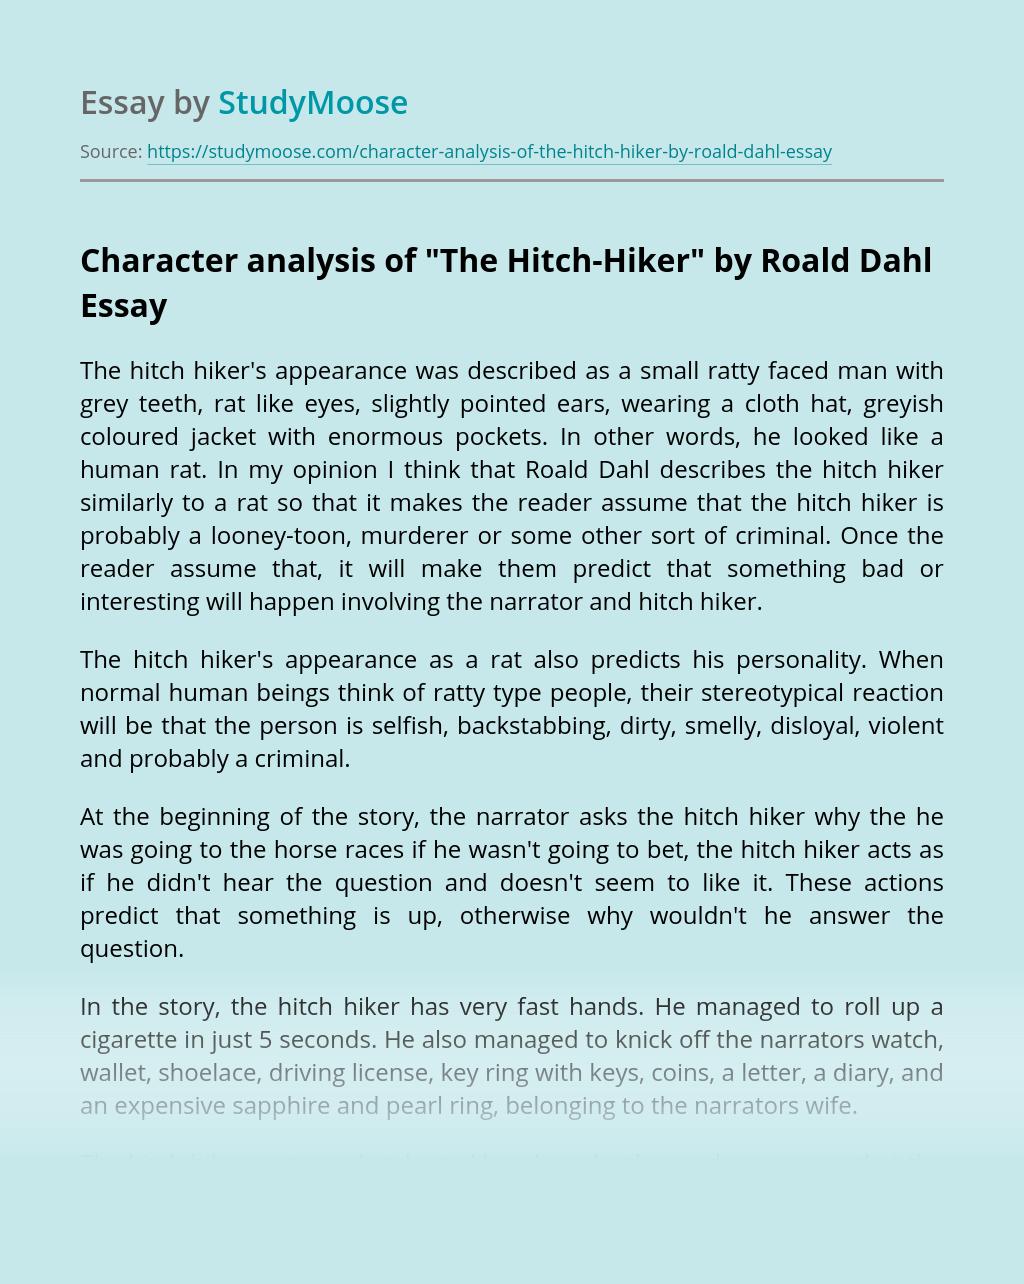 Character analysis of